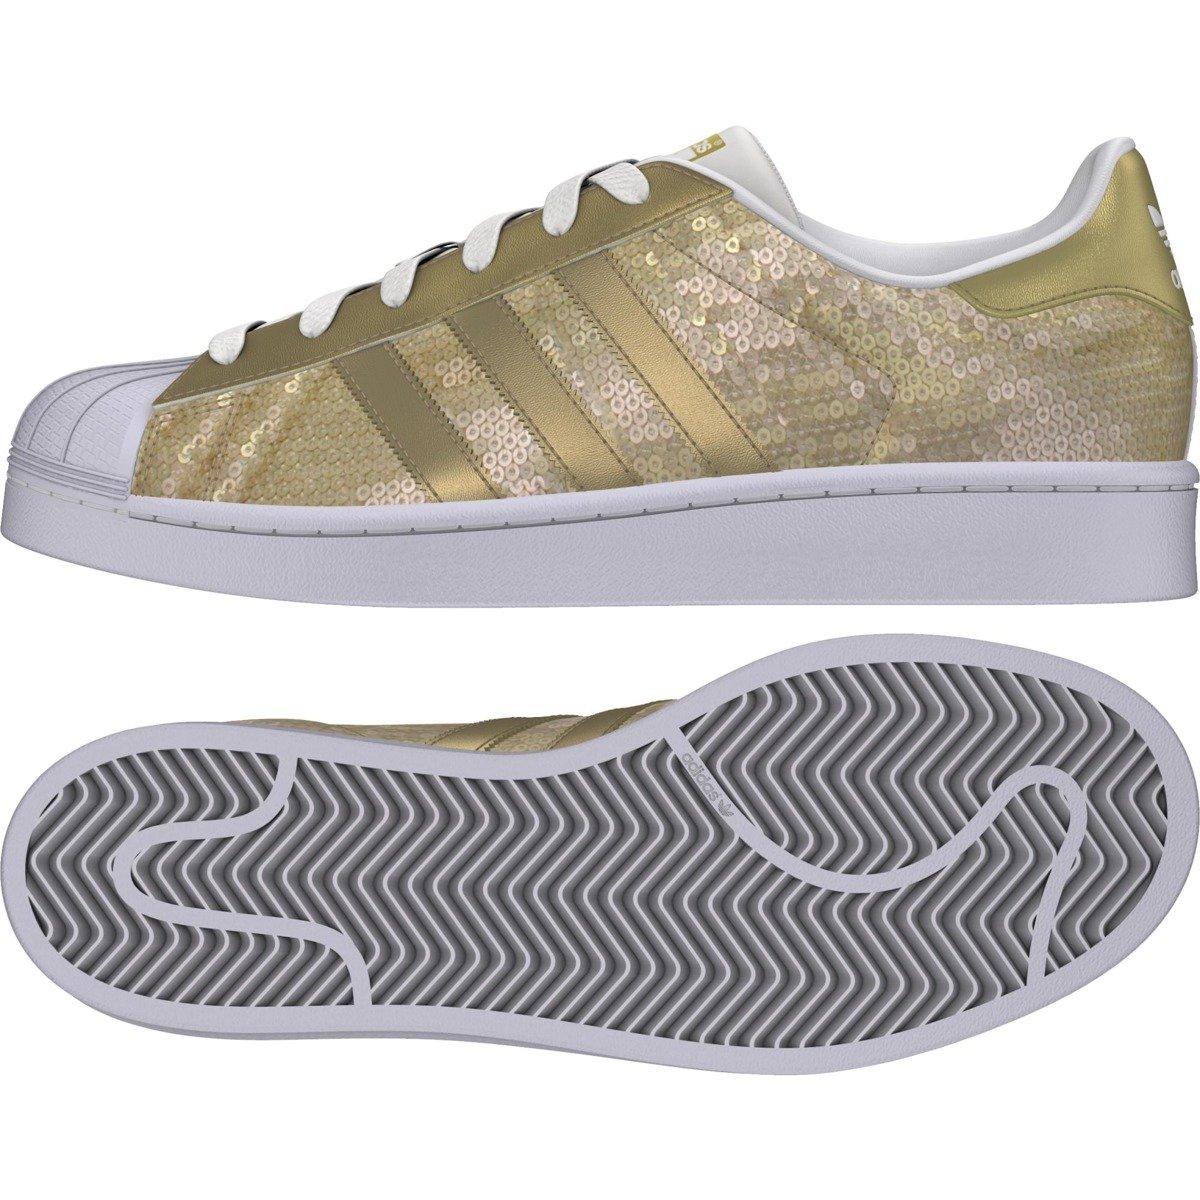 adidas superstar shoes s83383 basketball shoes. Black Bedroom Furniture Sets. Home Design Ideas